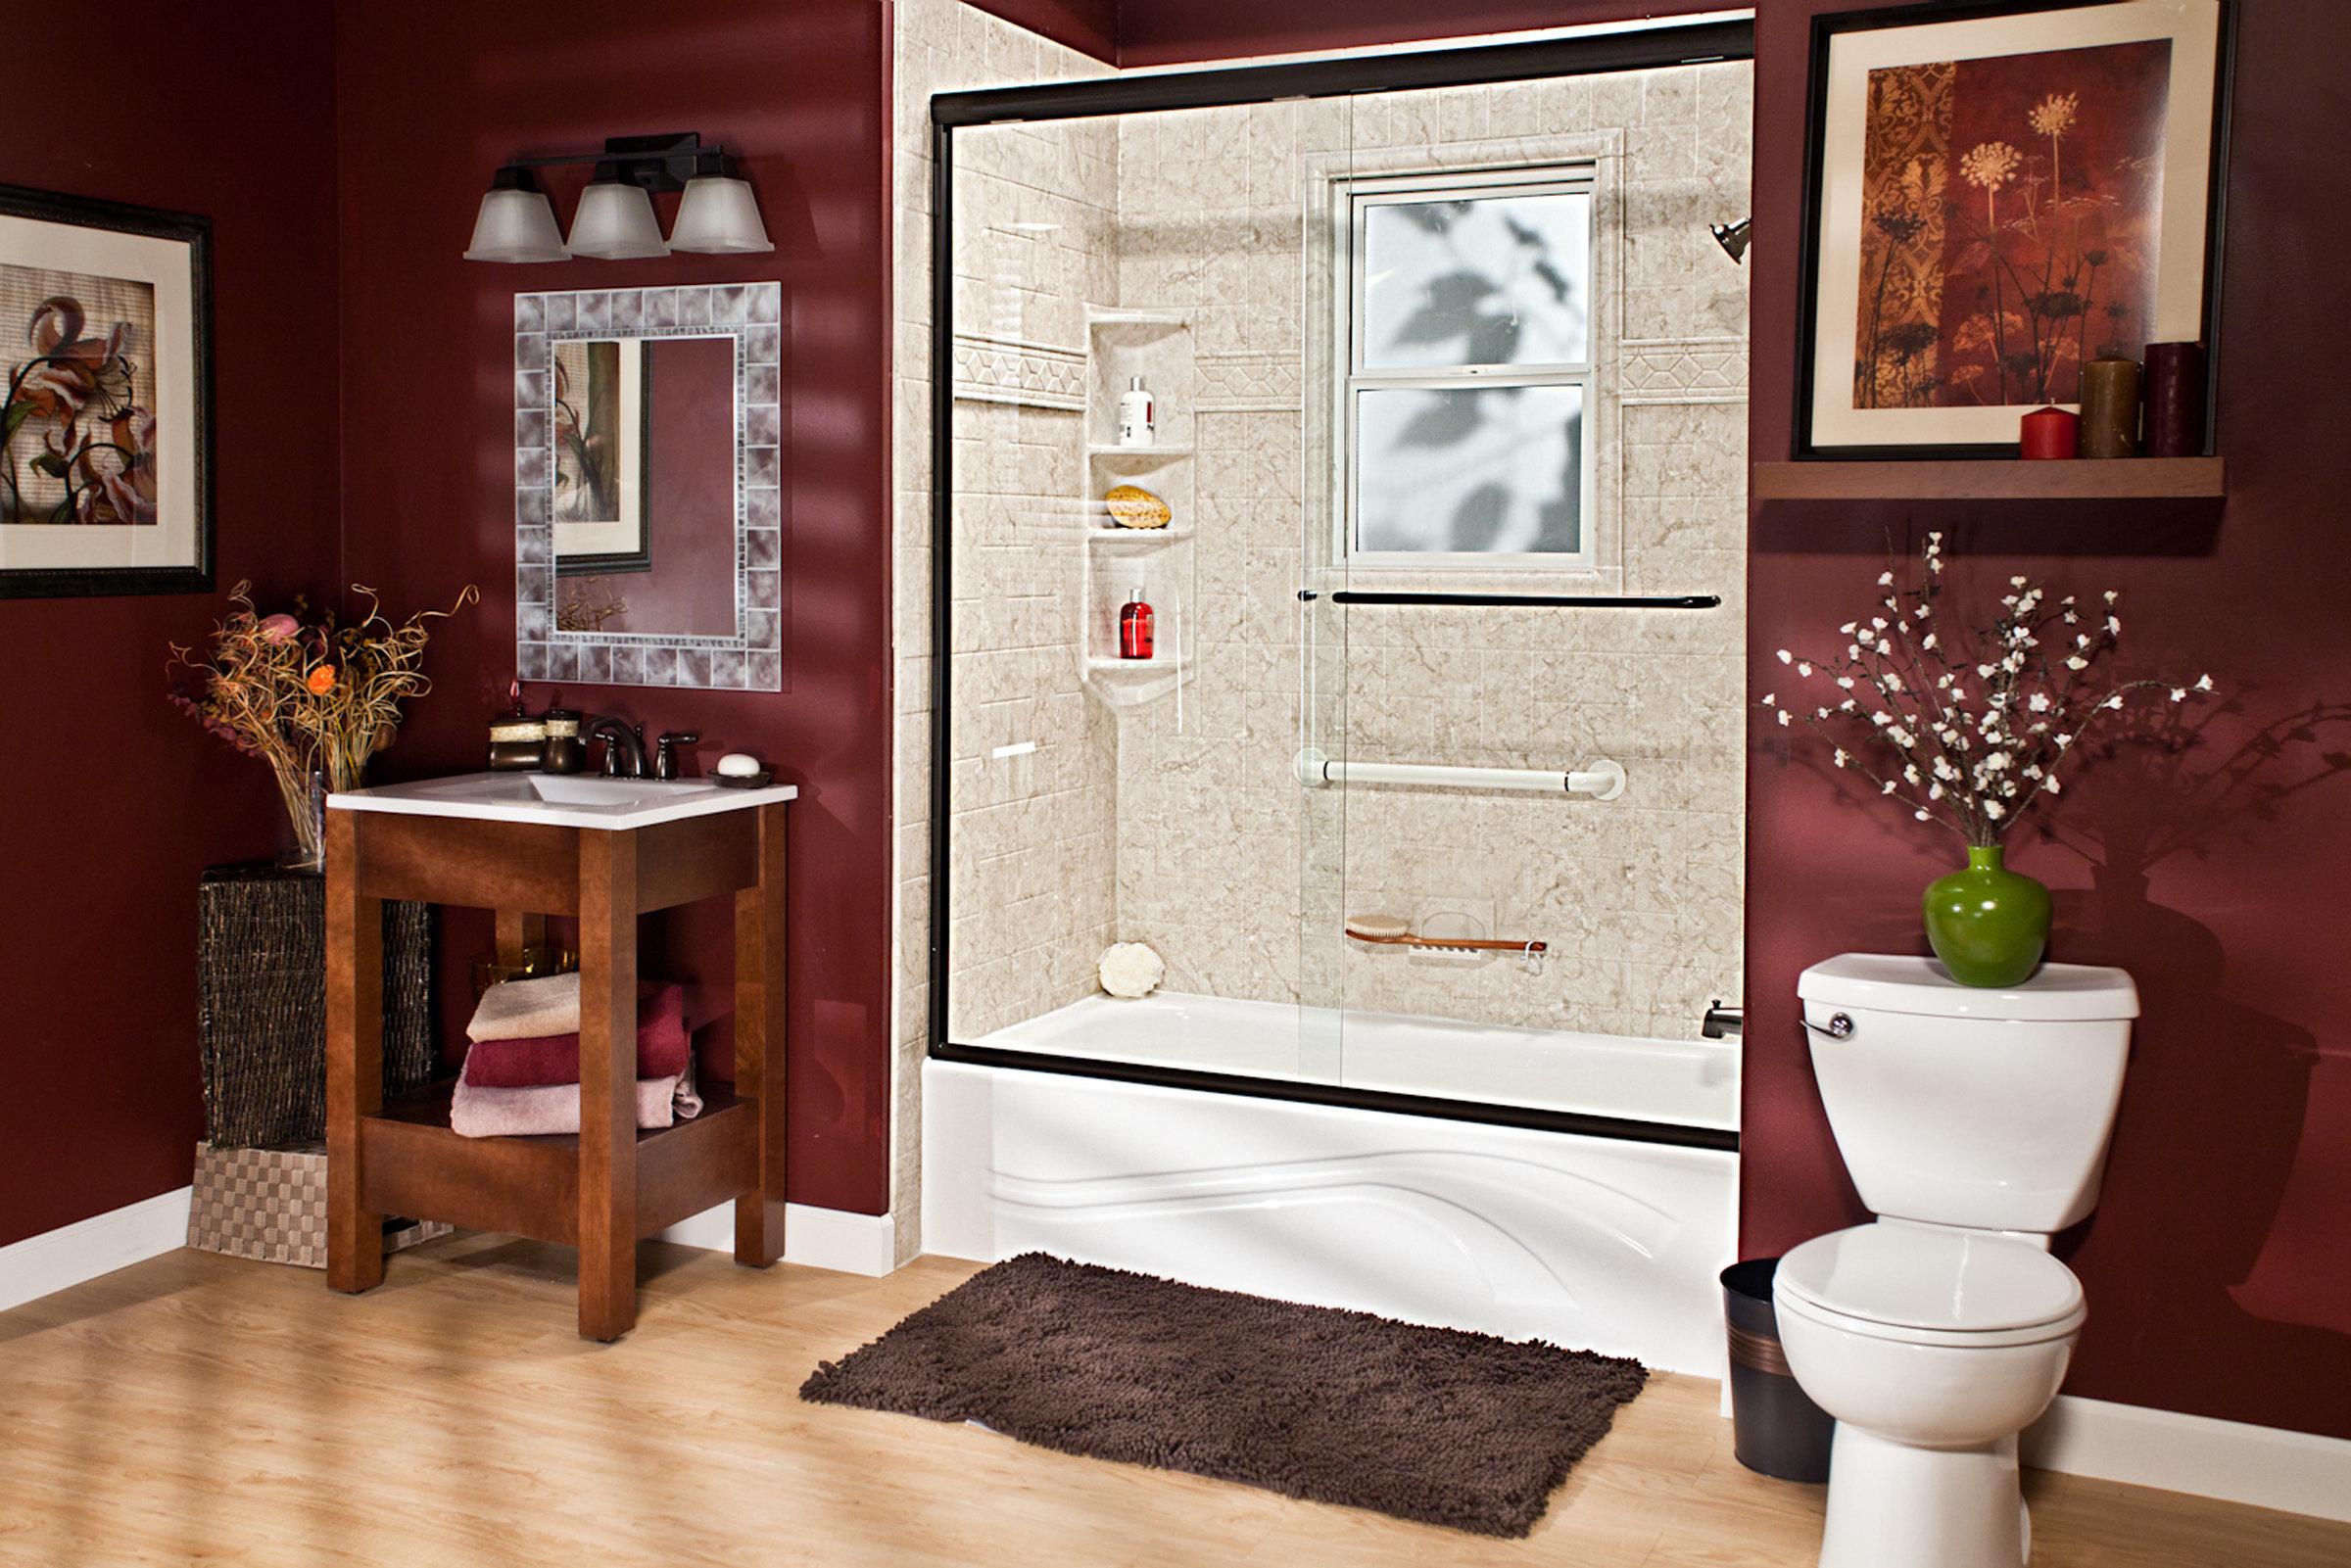 DuraStone Bath Products New Walls Only Keep Tub 00086